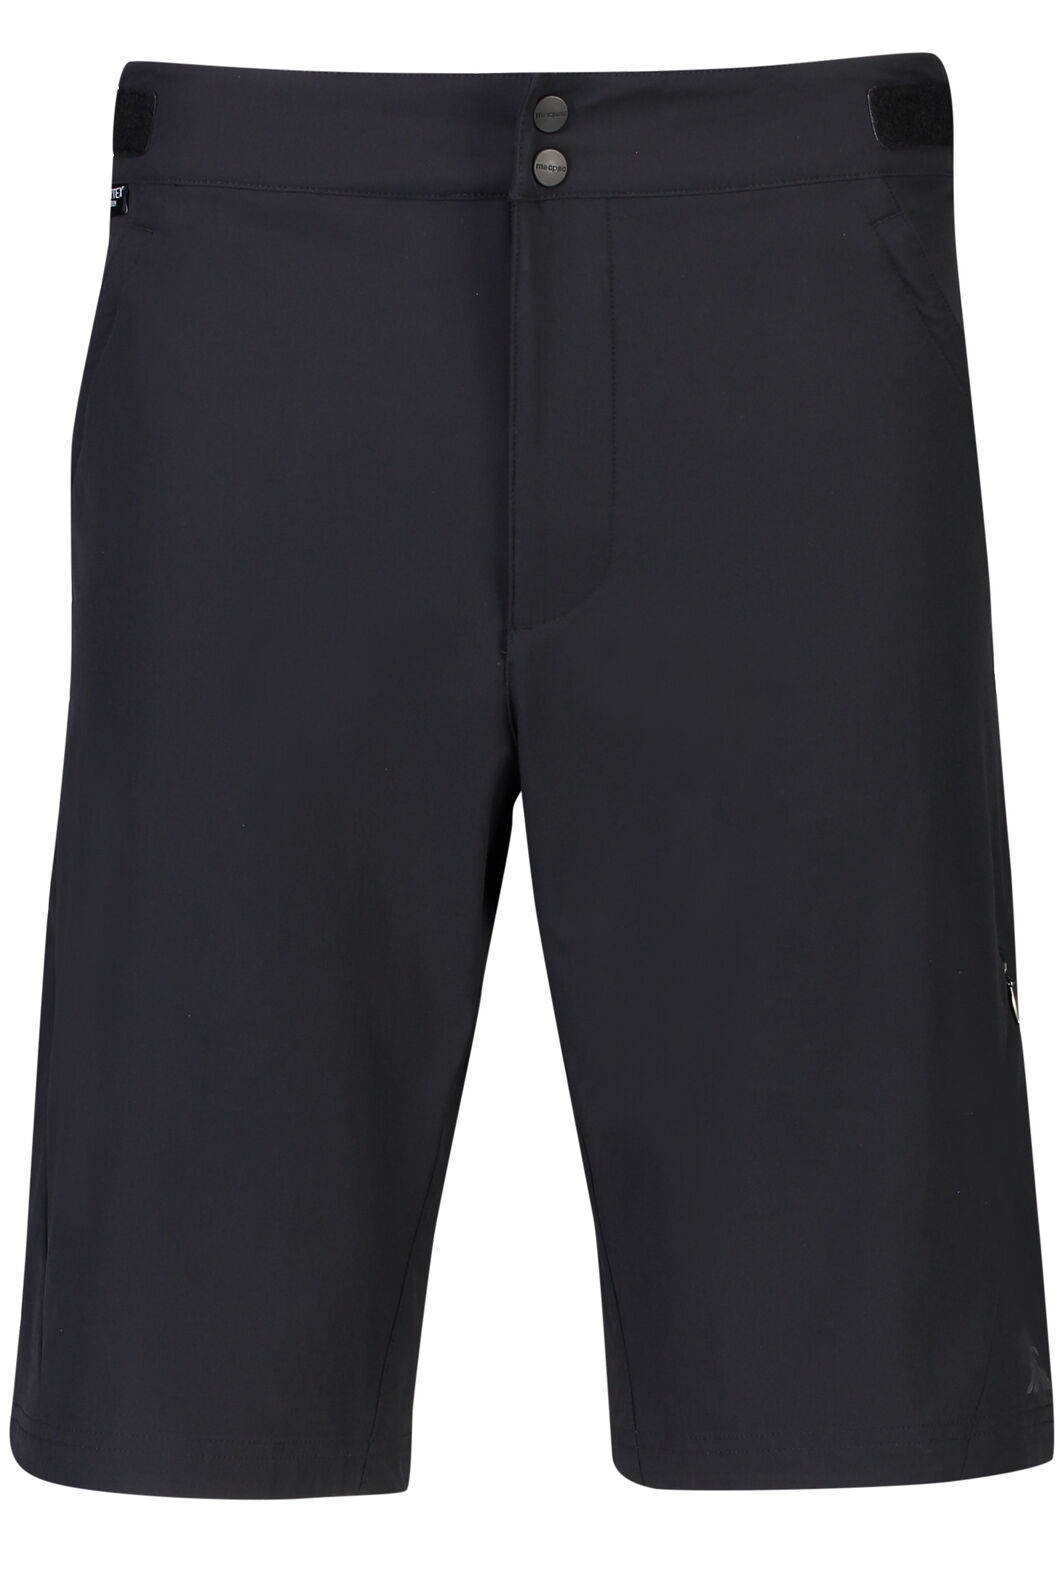 Macpac Stretch Pertex Equilibrium® Mountain Bike Shorts - Men's, Black, hi-res